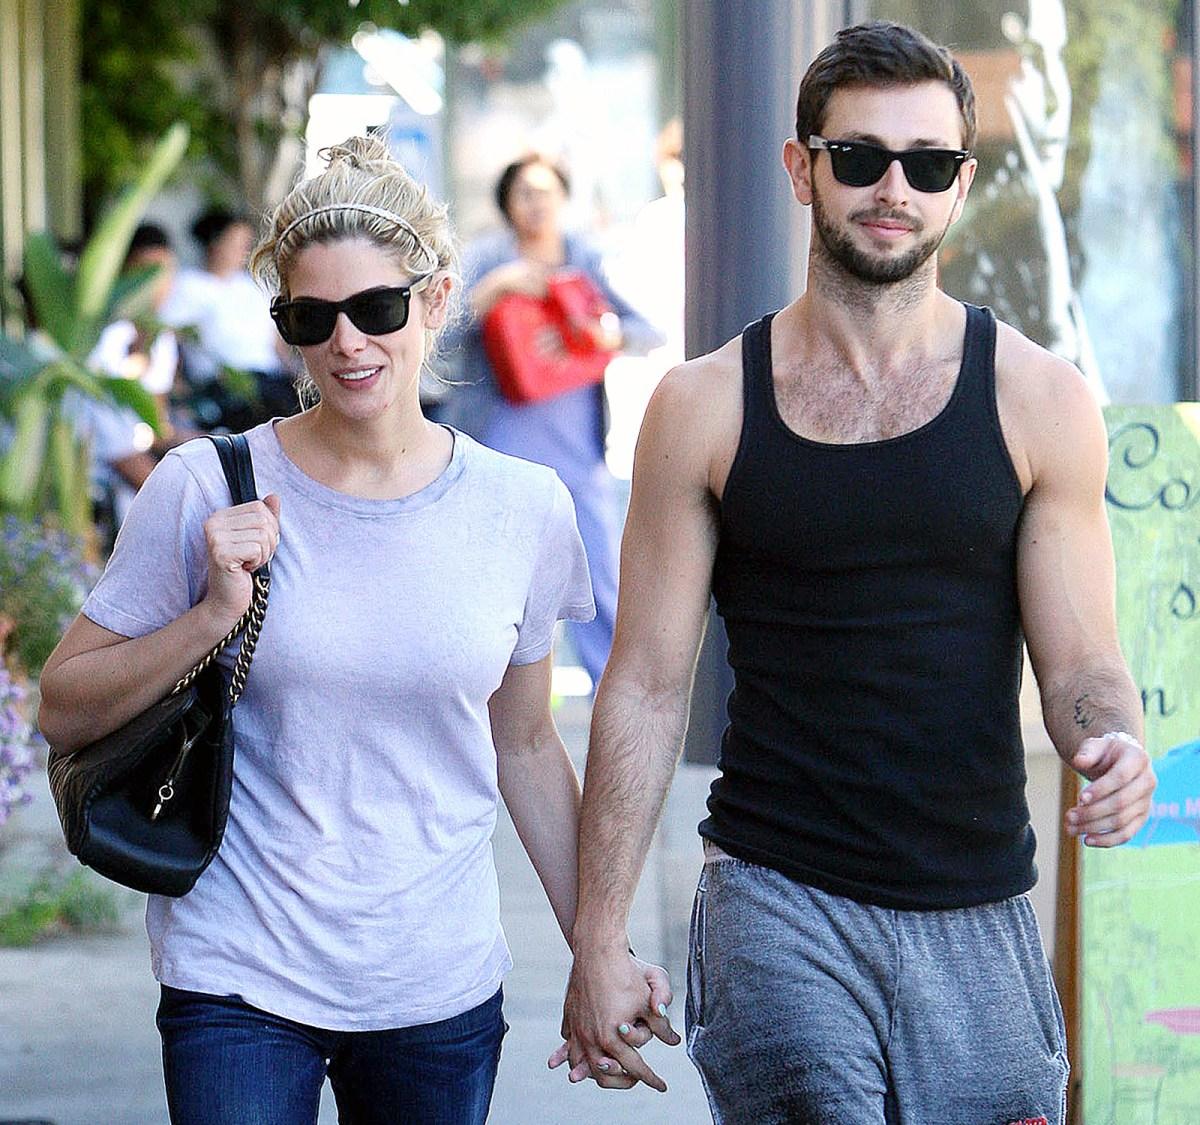 Ashley Greene Dating Liam Hemsworth's Best Friend Paul Khoury, Not Engaged